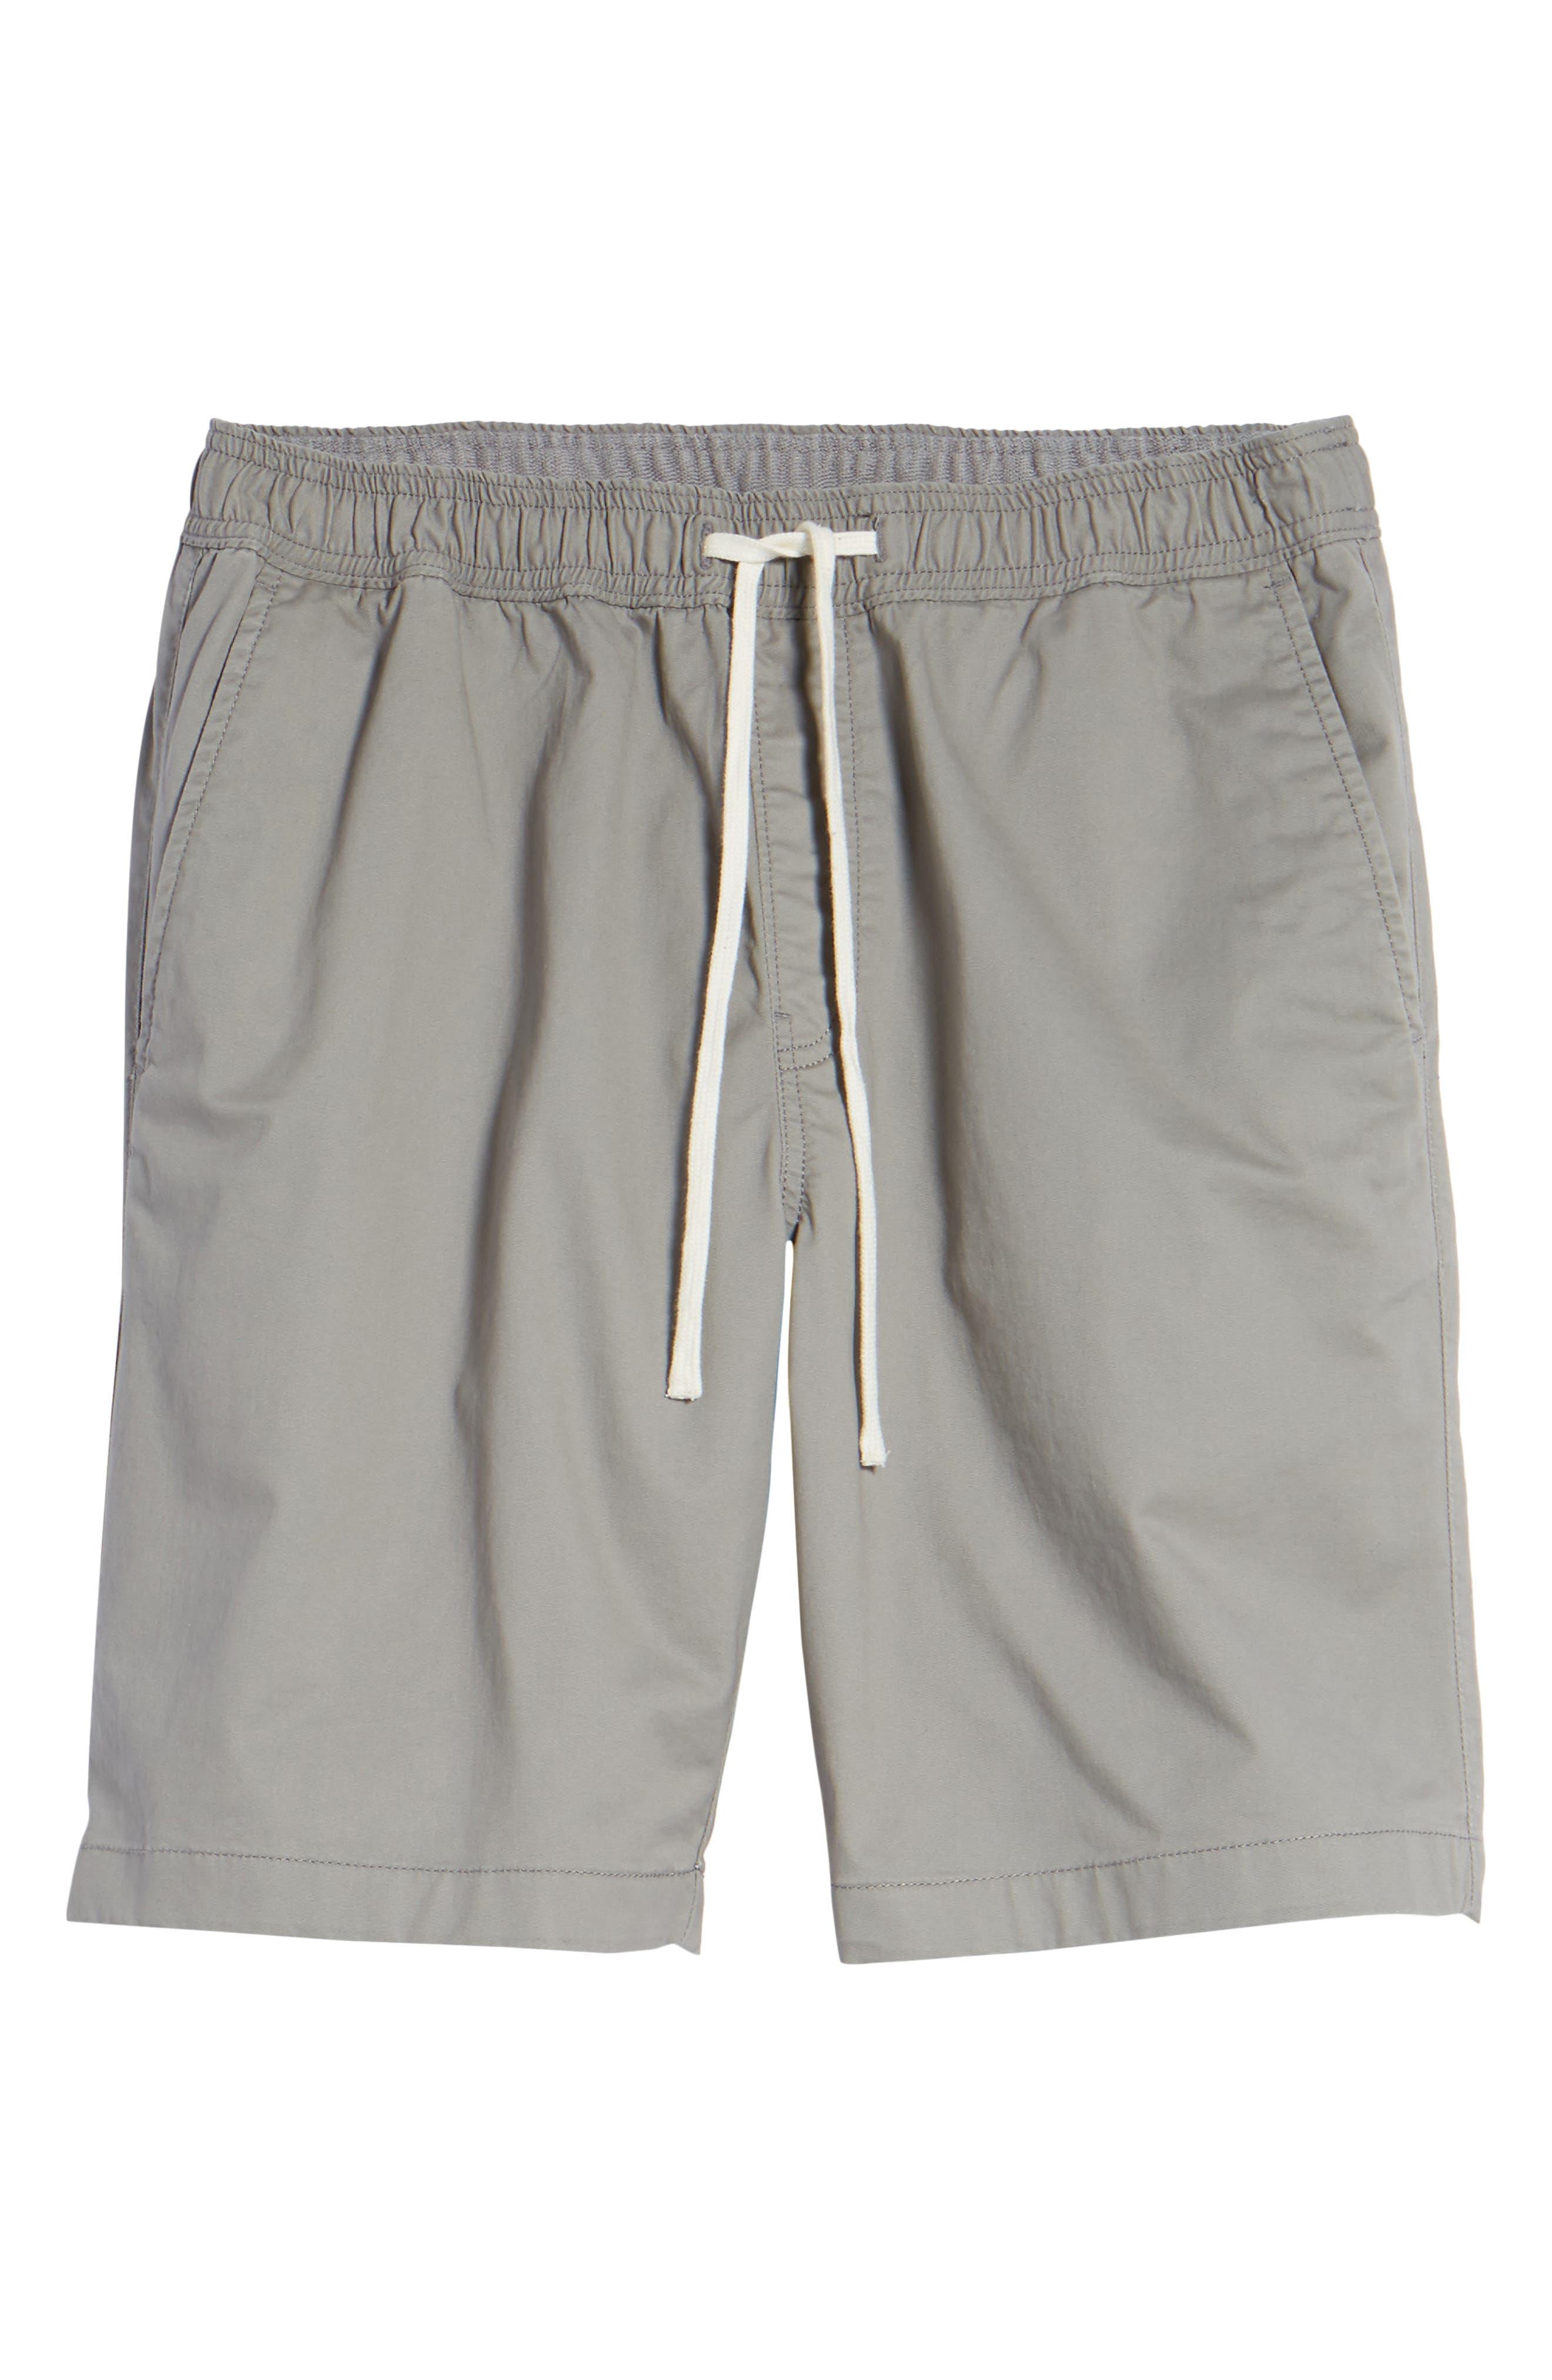 Ballard Slim Fit Shorts,                             Alternate thumbnail 6, color,                             030